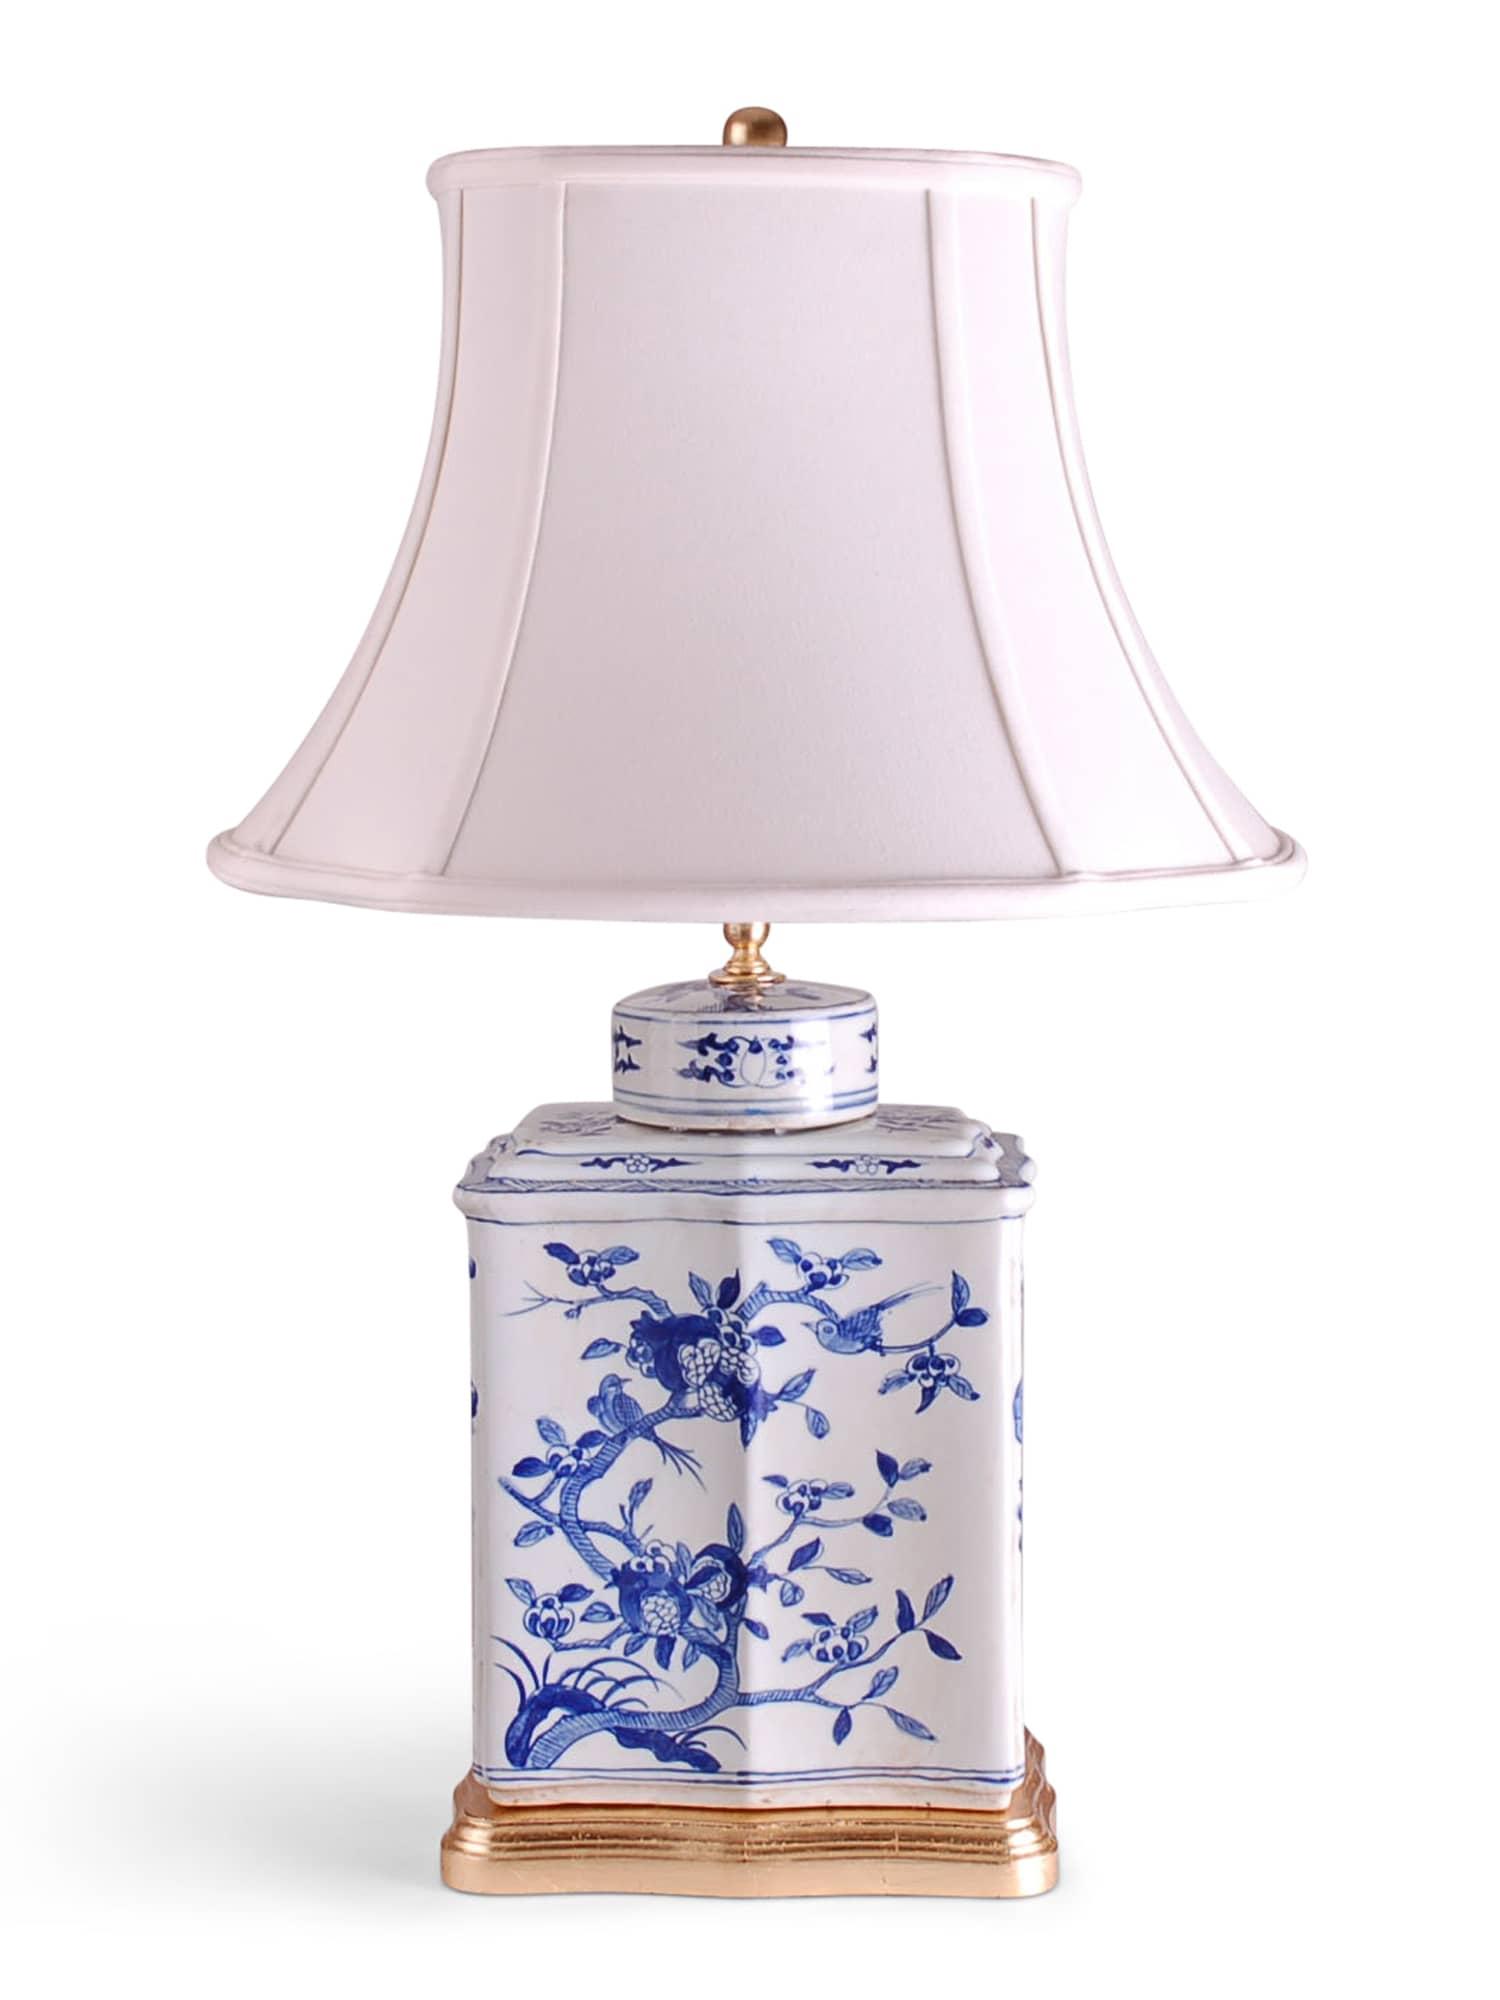 Blue And White Bird Flower Tea Cad Lamp